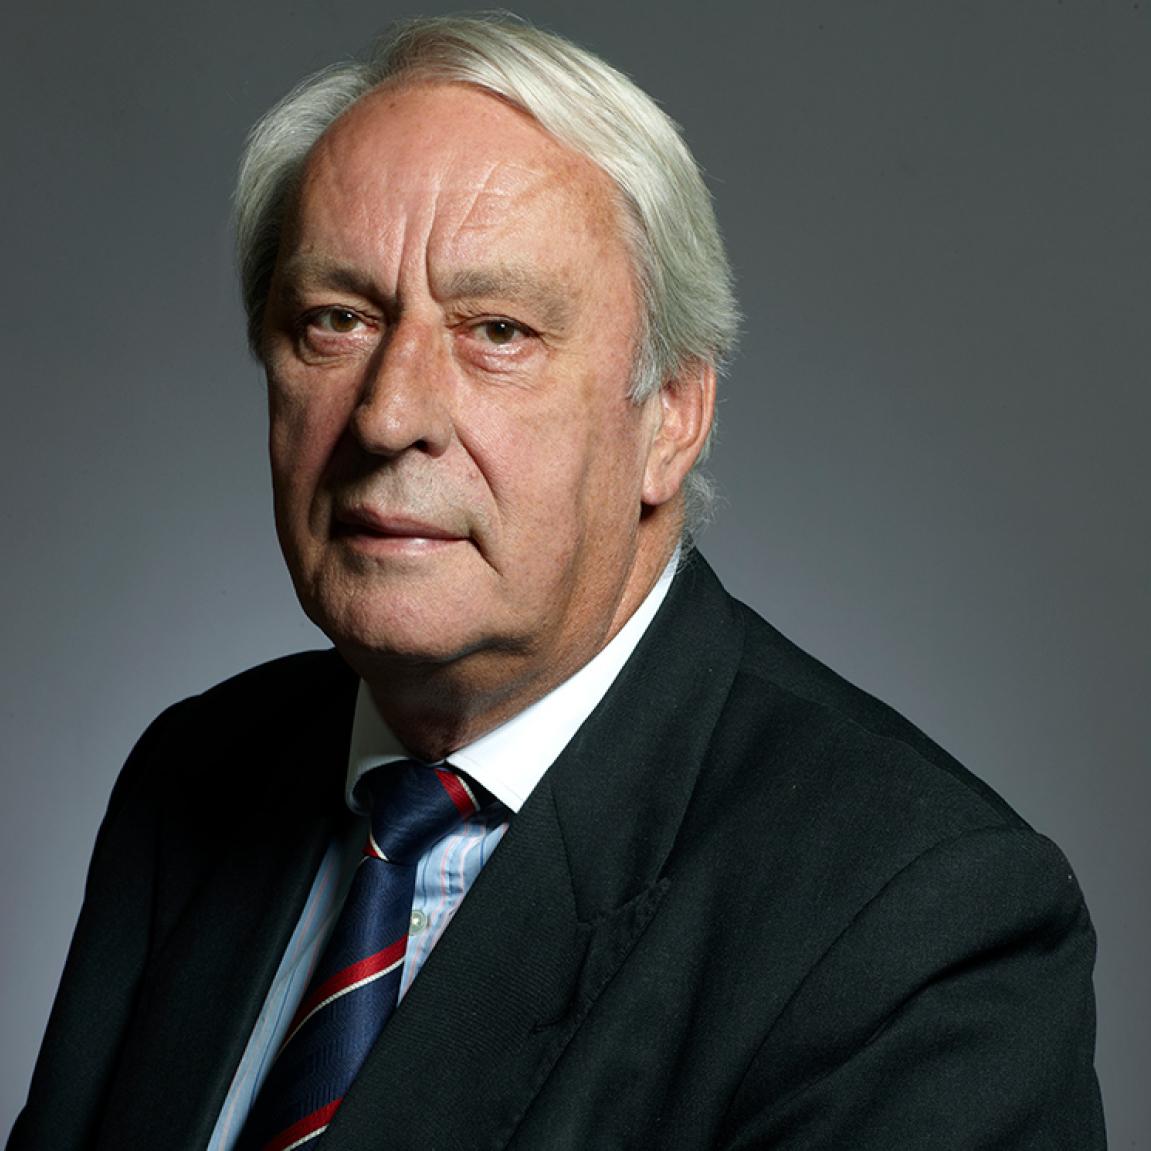 Roger Lane-Smith